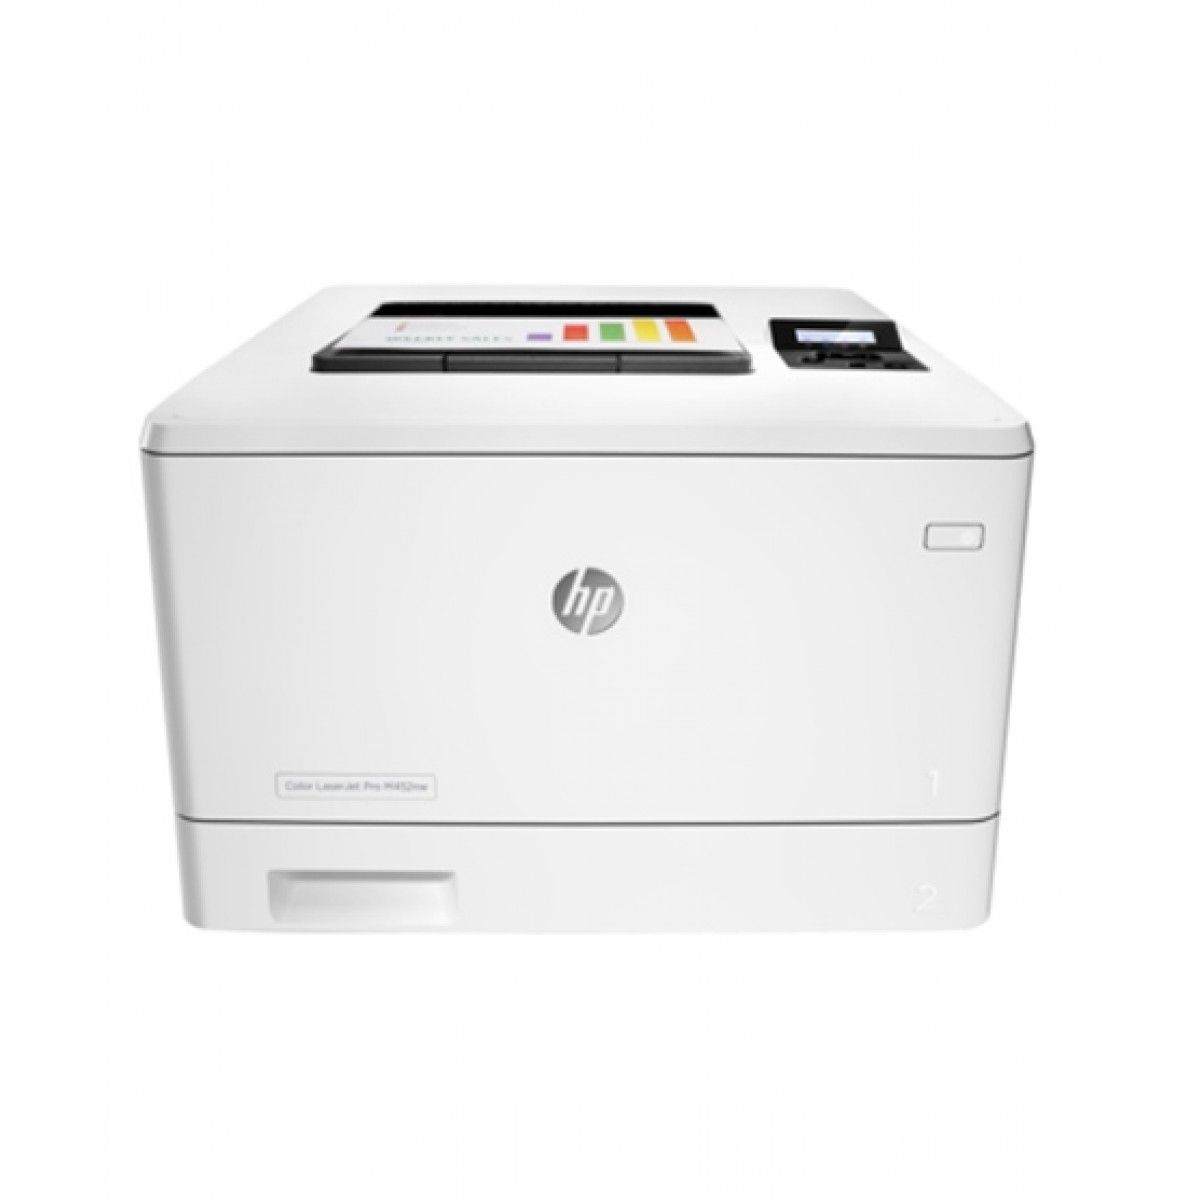 HP Color LaserJet Pro M452nw Printer CF388A